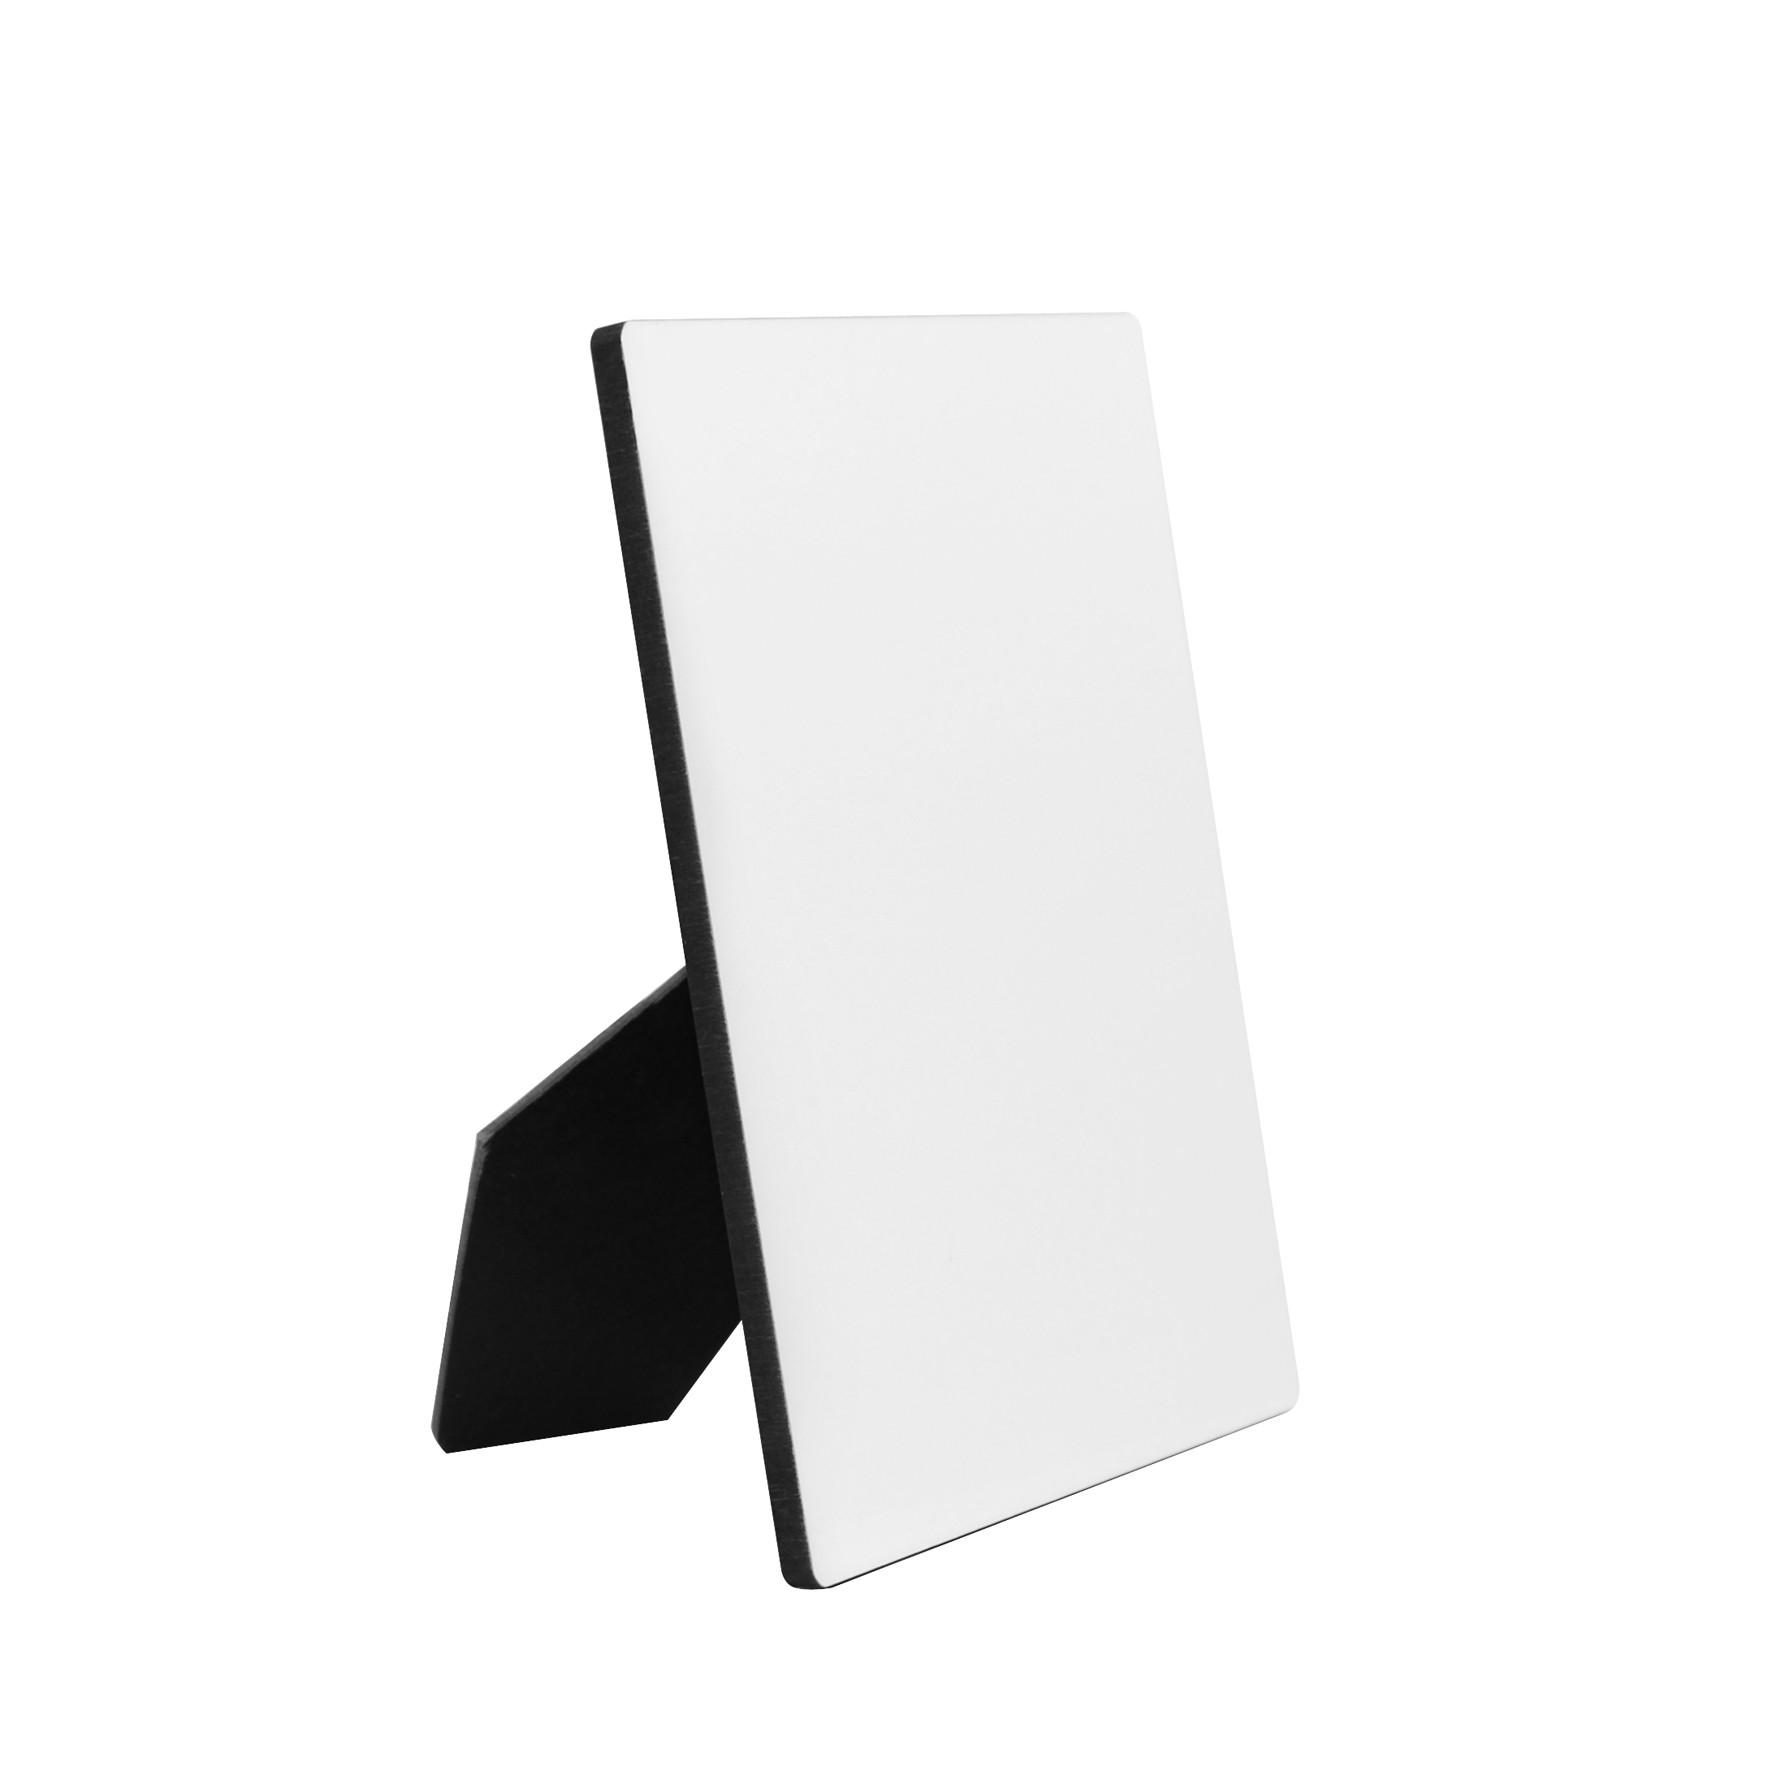 "5 x 7"" Hardboard Photo Frame Blank"